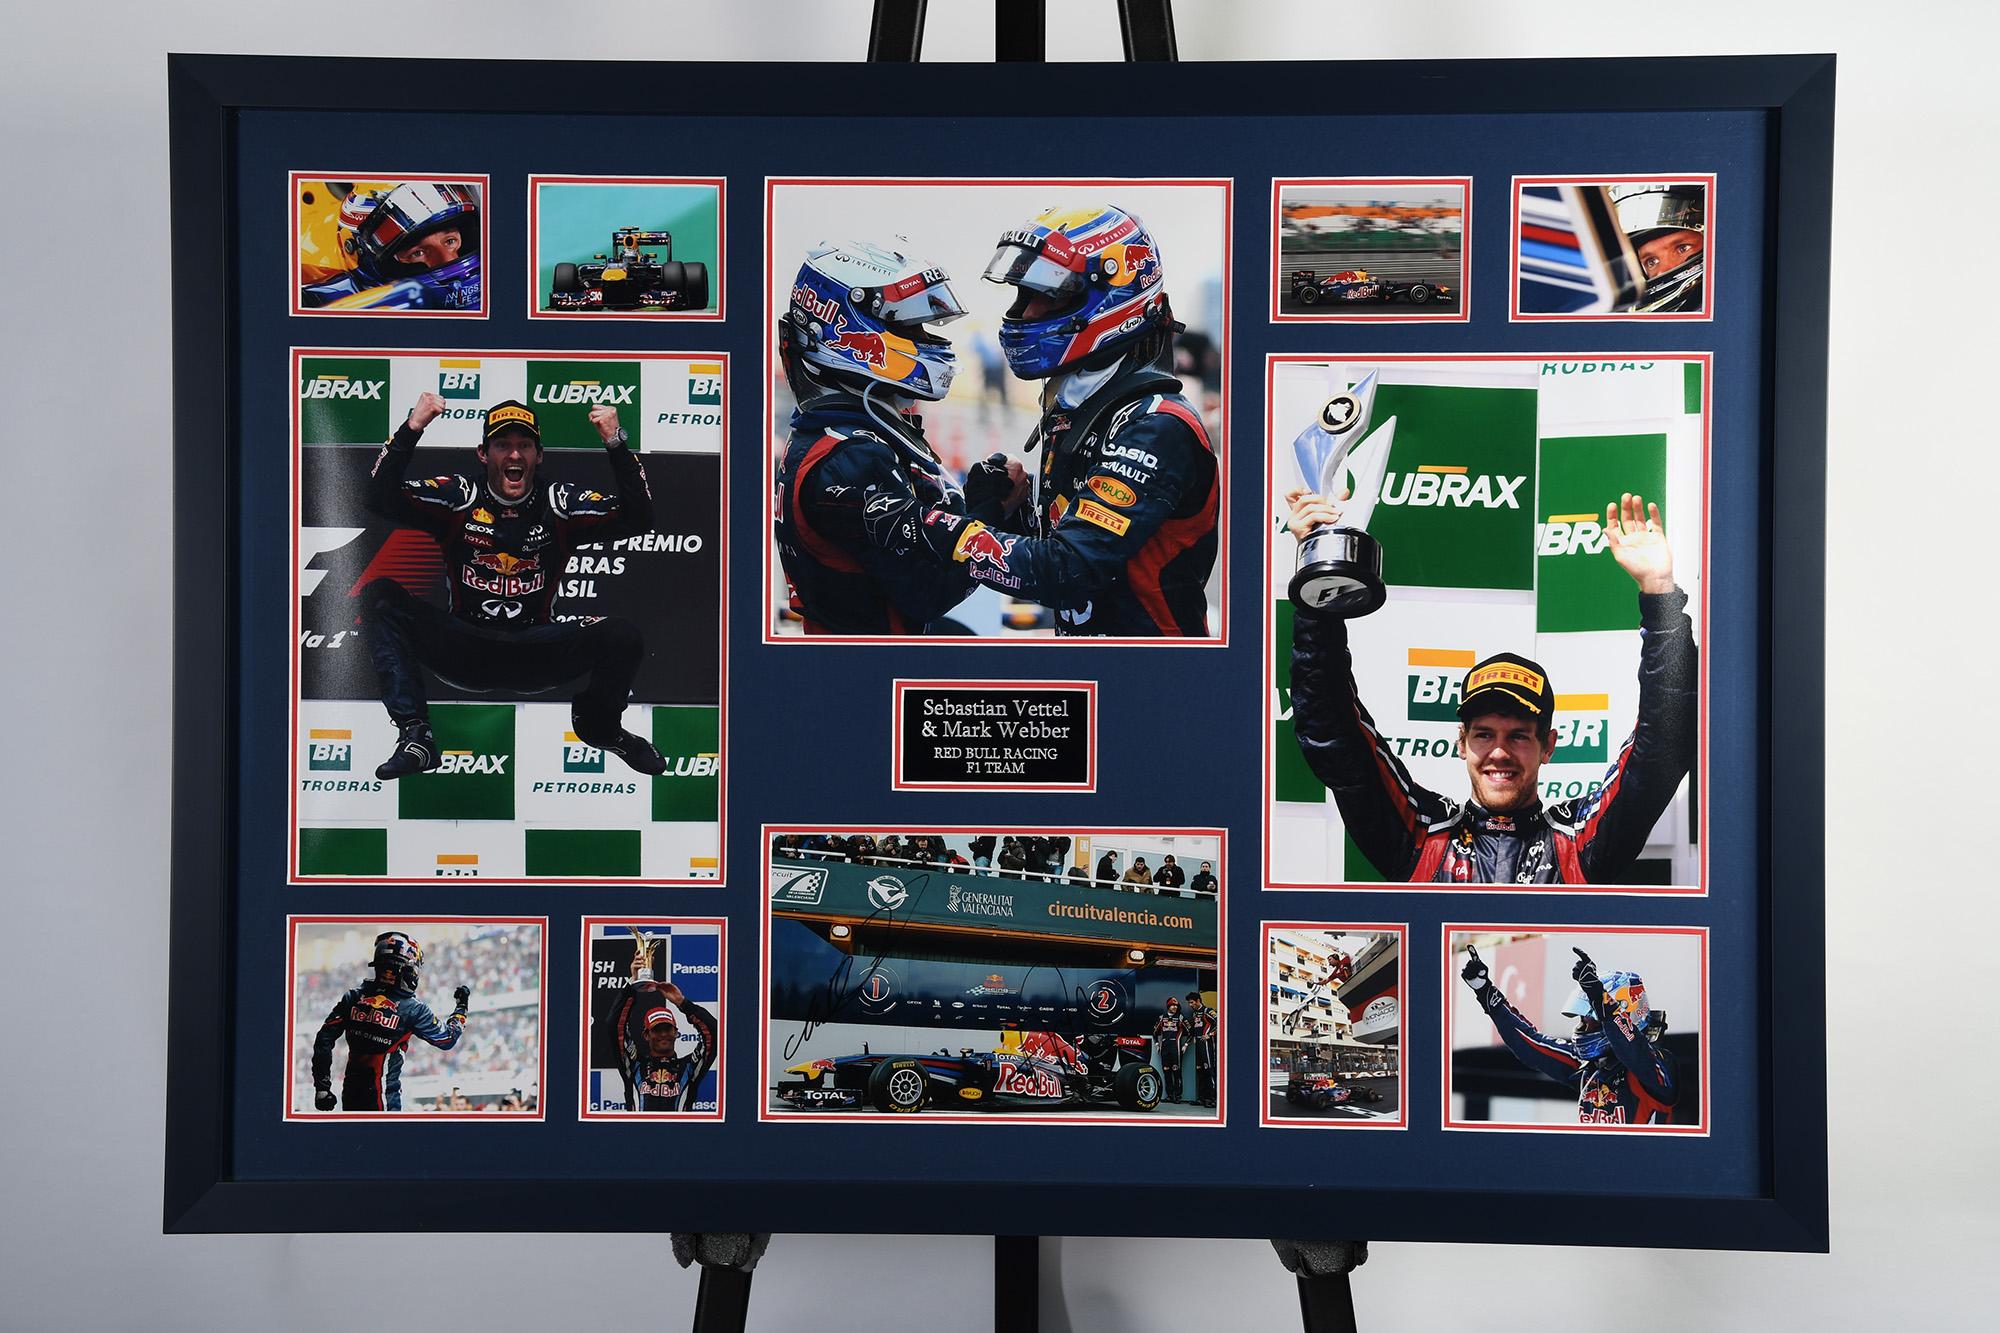 Webber And Vettel Signed Photo Presentation - Image 2 of 2